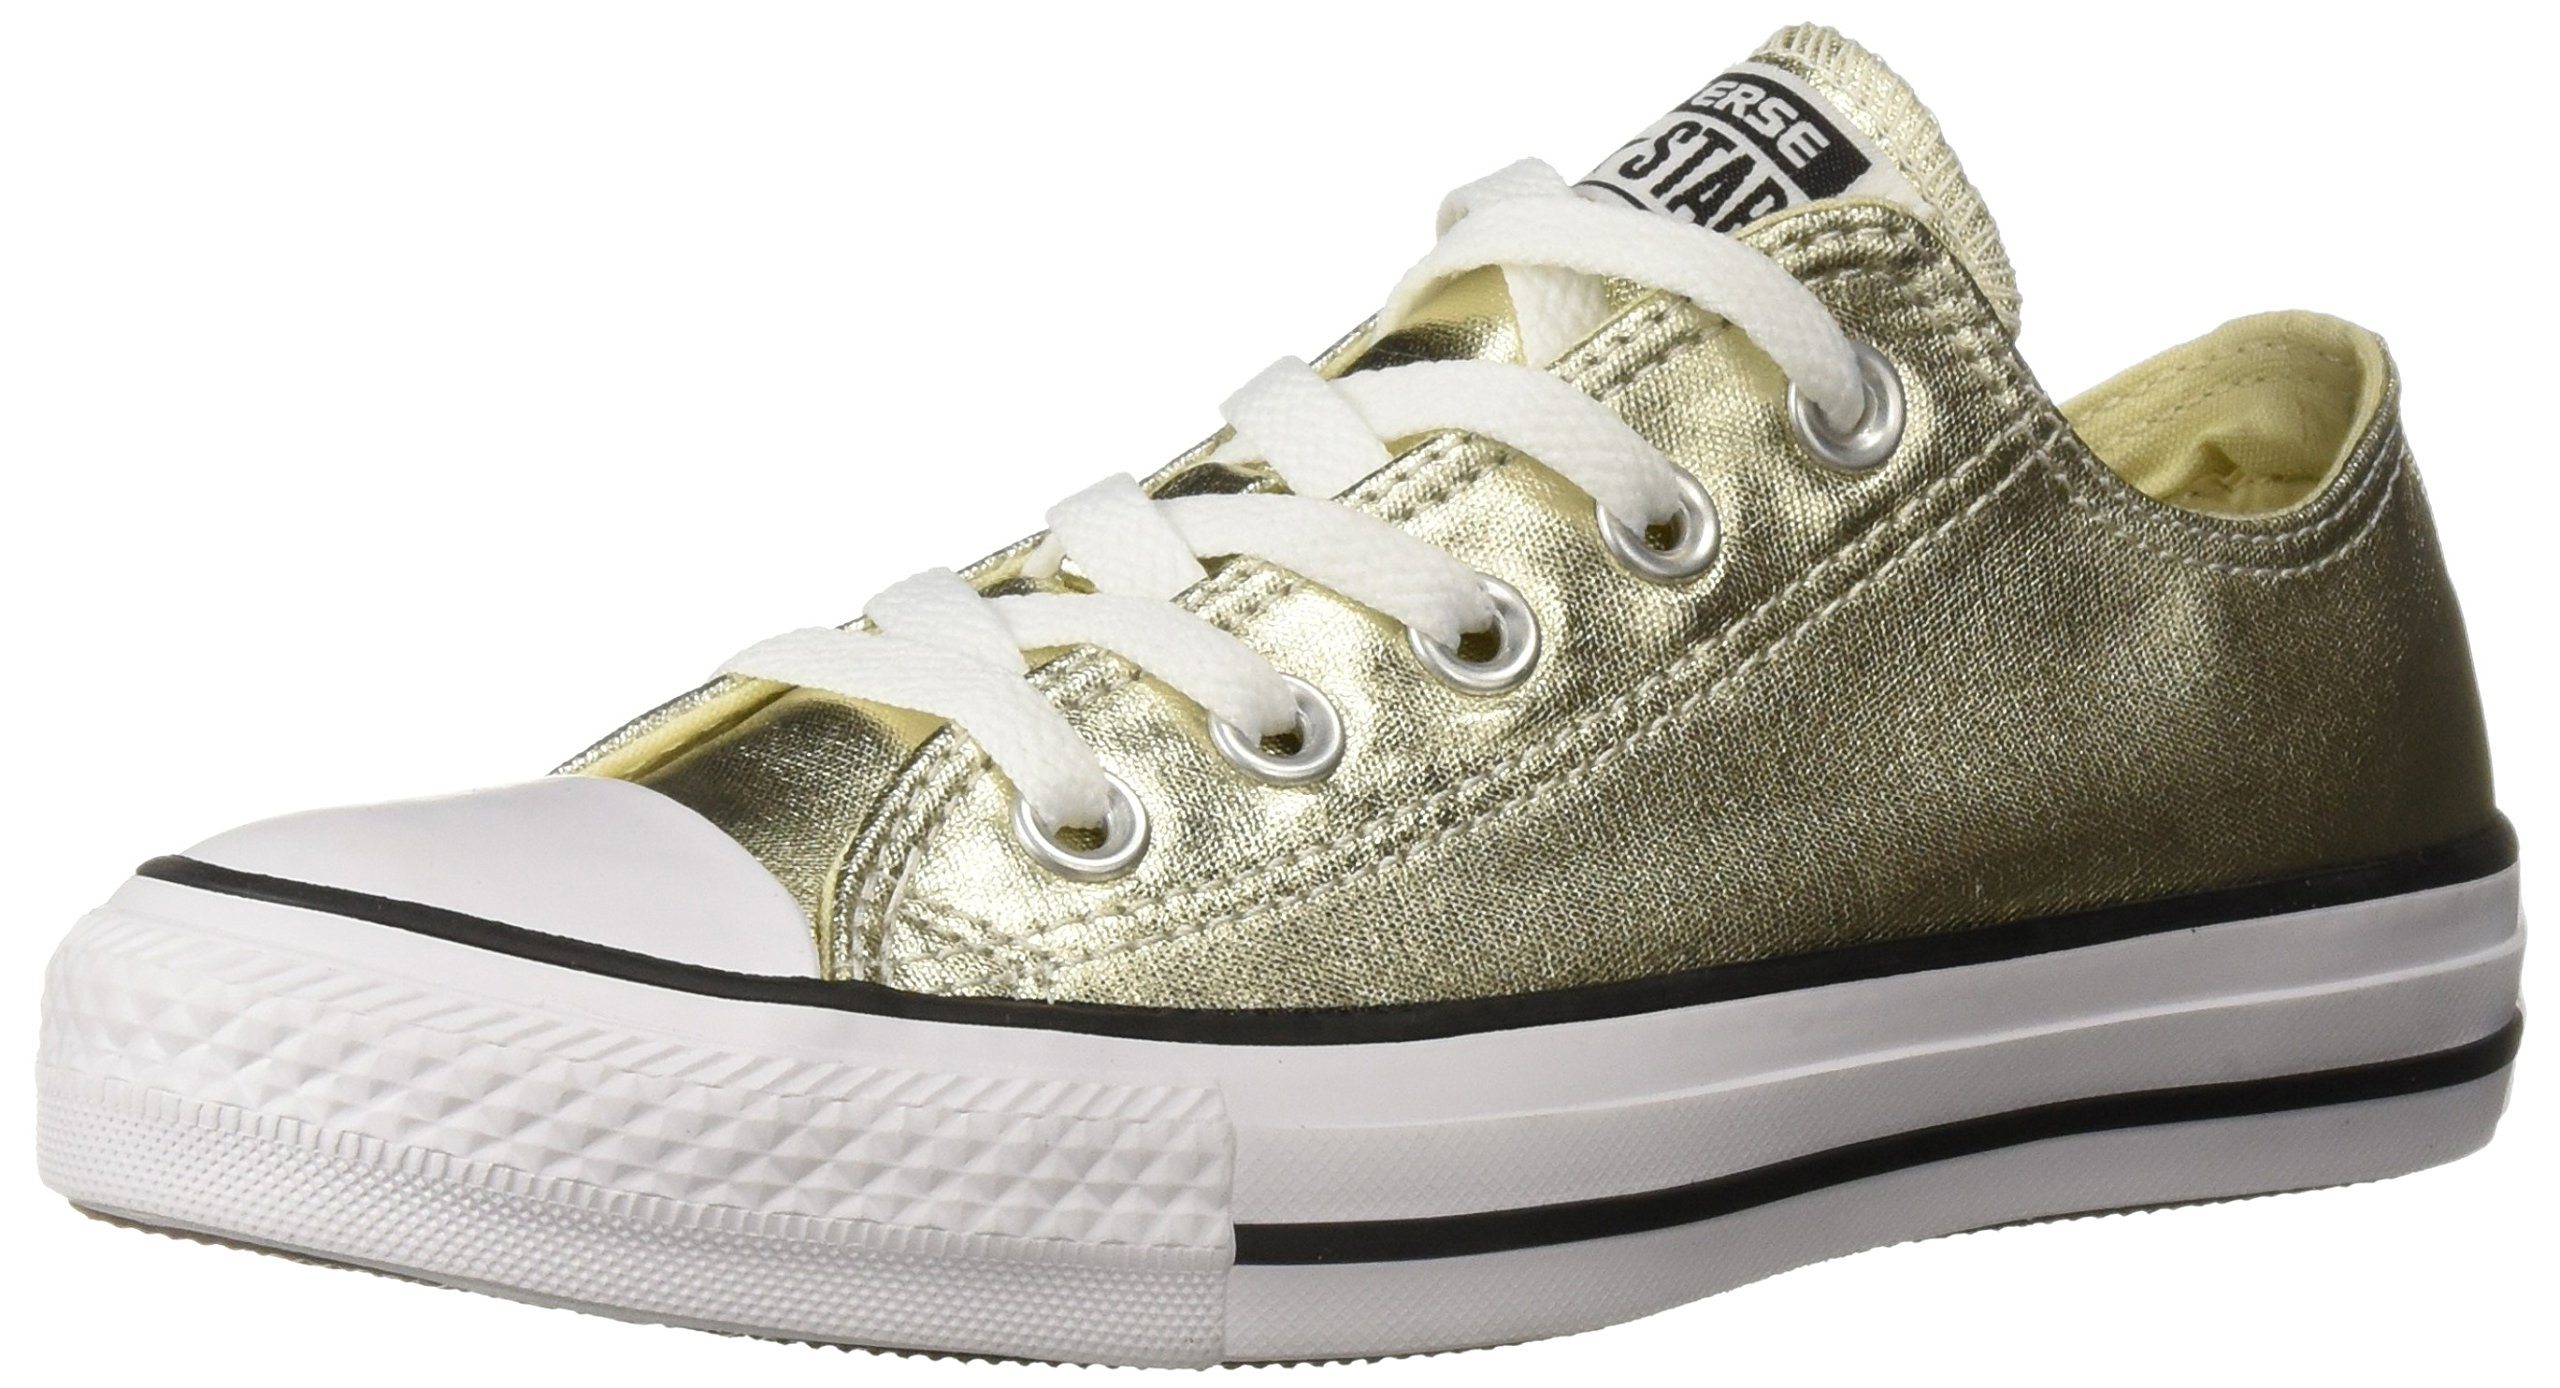 4e89e2badf2f Galleon - Converse Kids K All Star Low Shoes Light Gold White Black Size  10.5